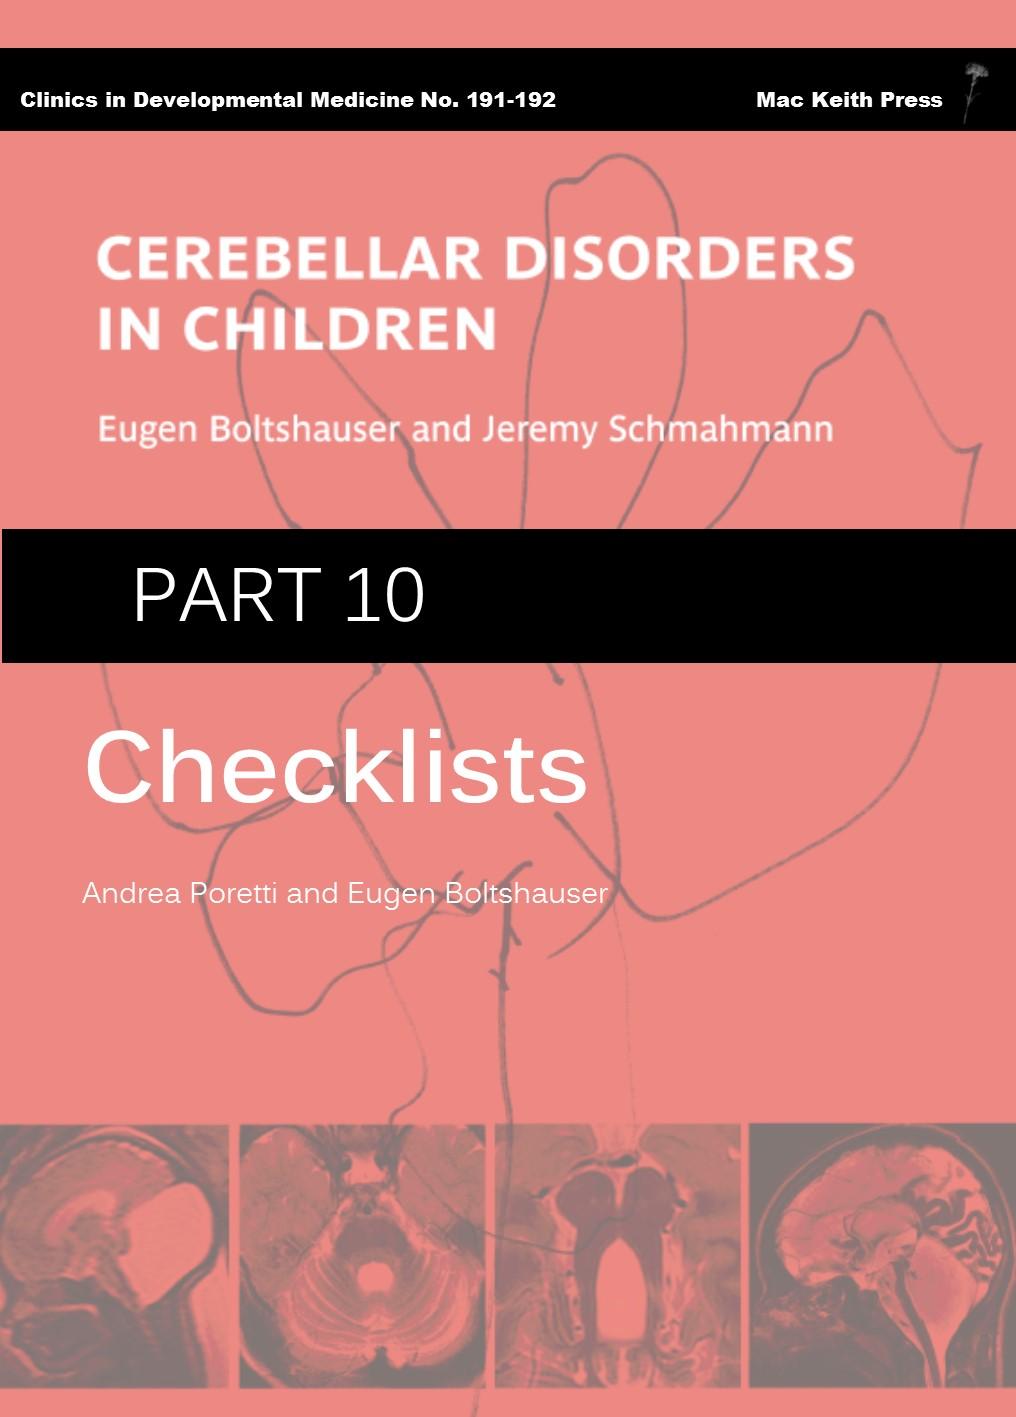 Cerebellar Disorders in Children - Part 10: Checklists COVER